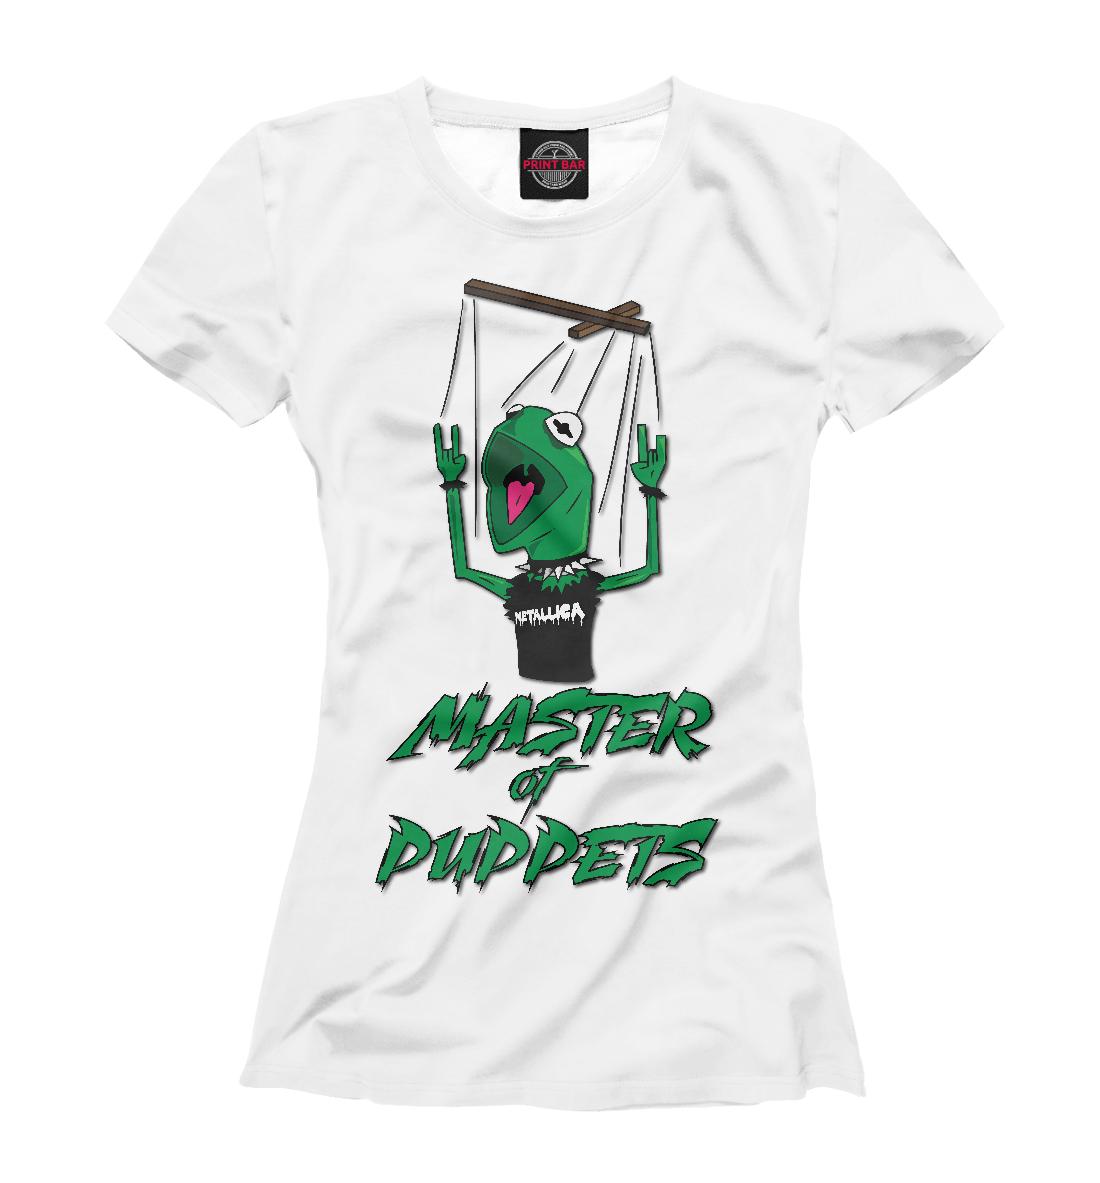 Metallica Master of Puppets metallica master of puppets